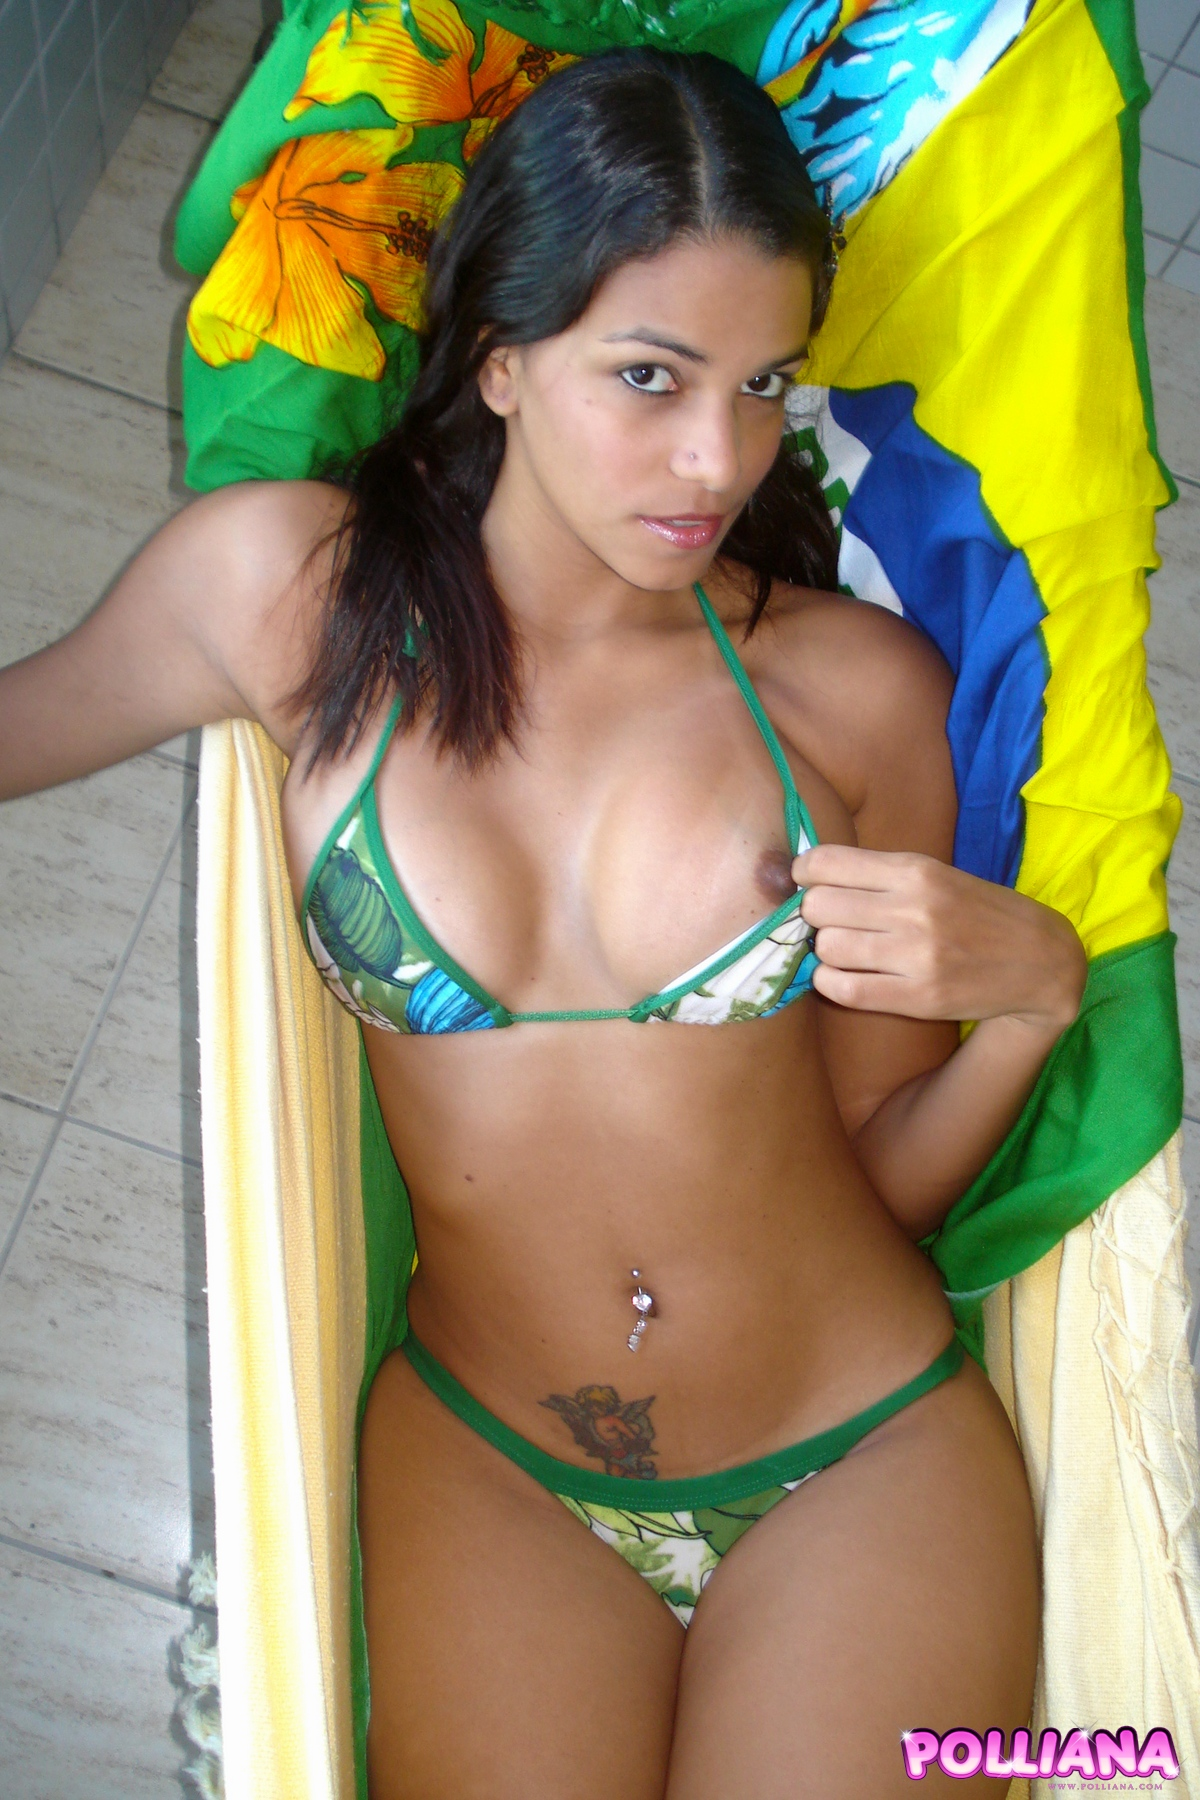 polliana-brazilbeachtowel-13.jpg